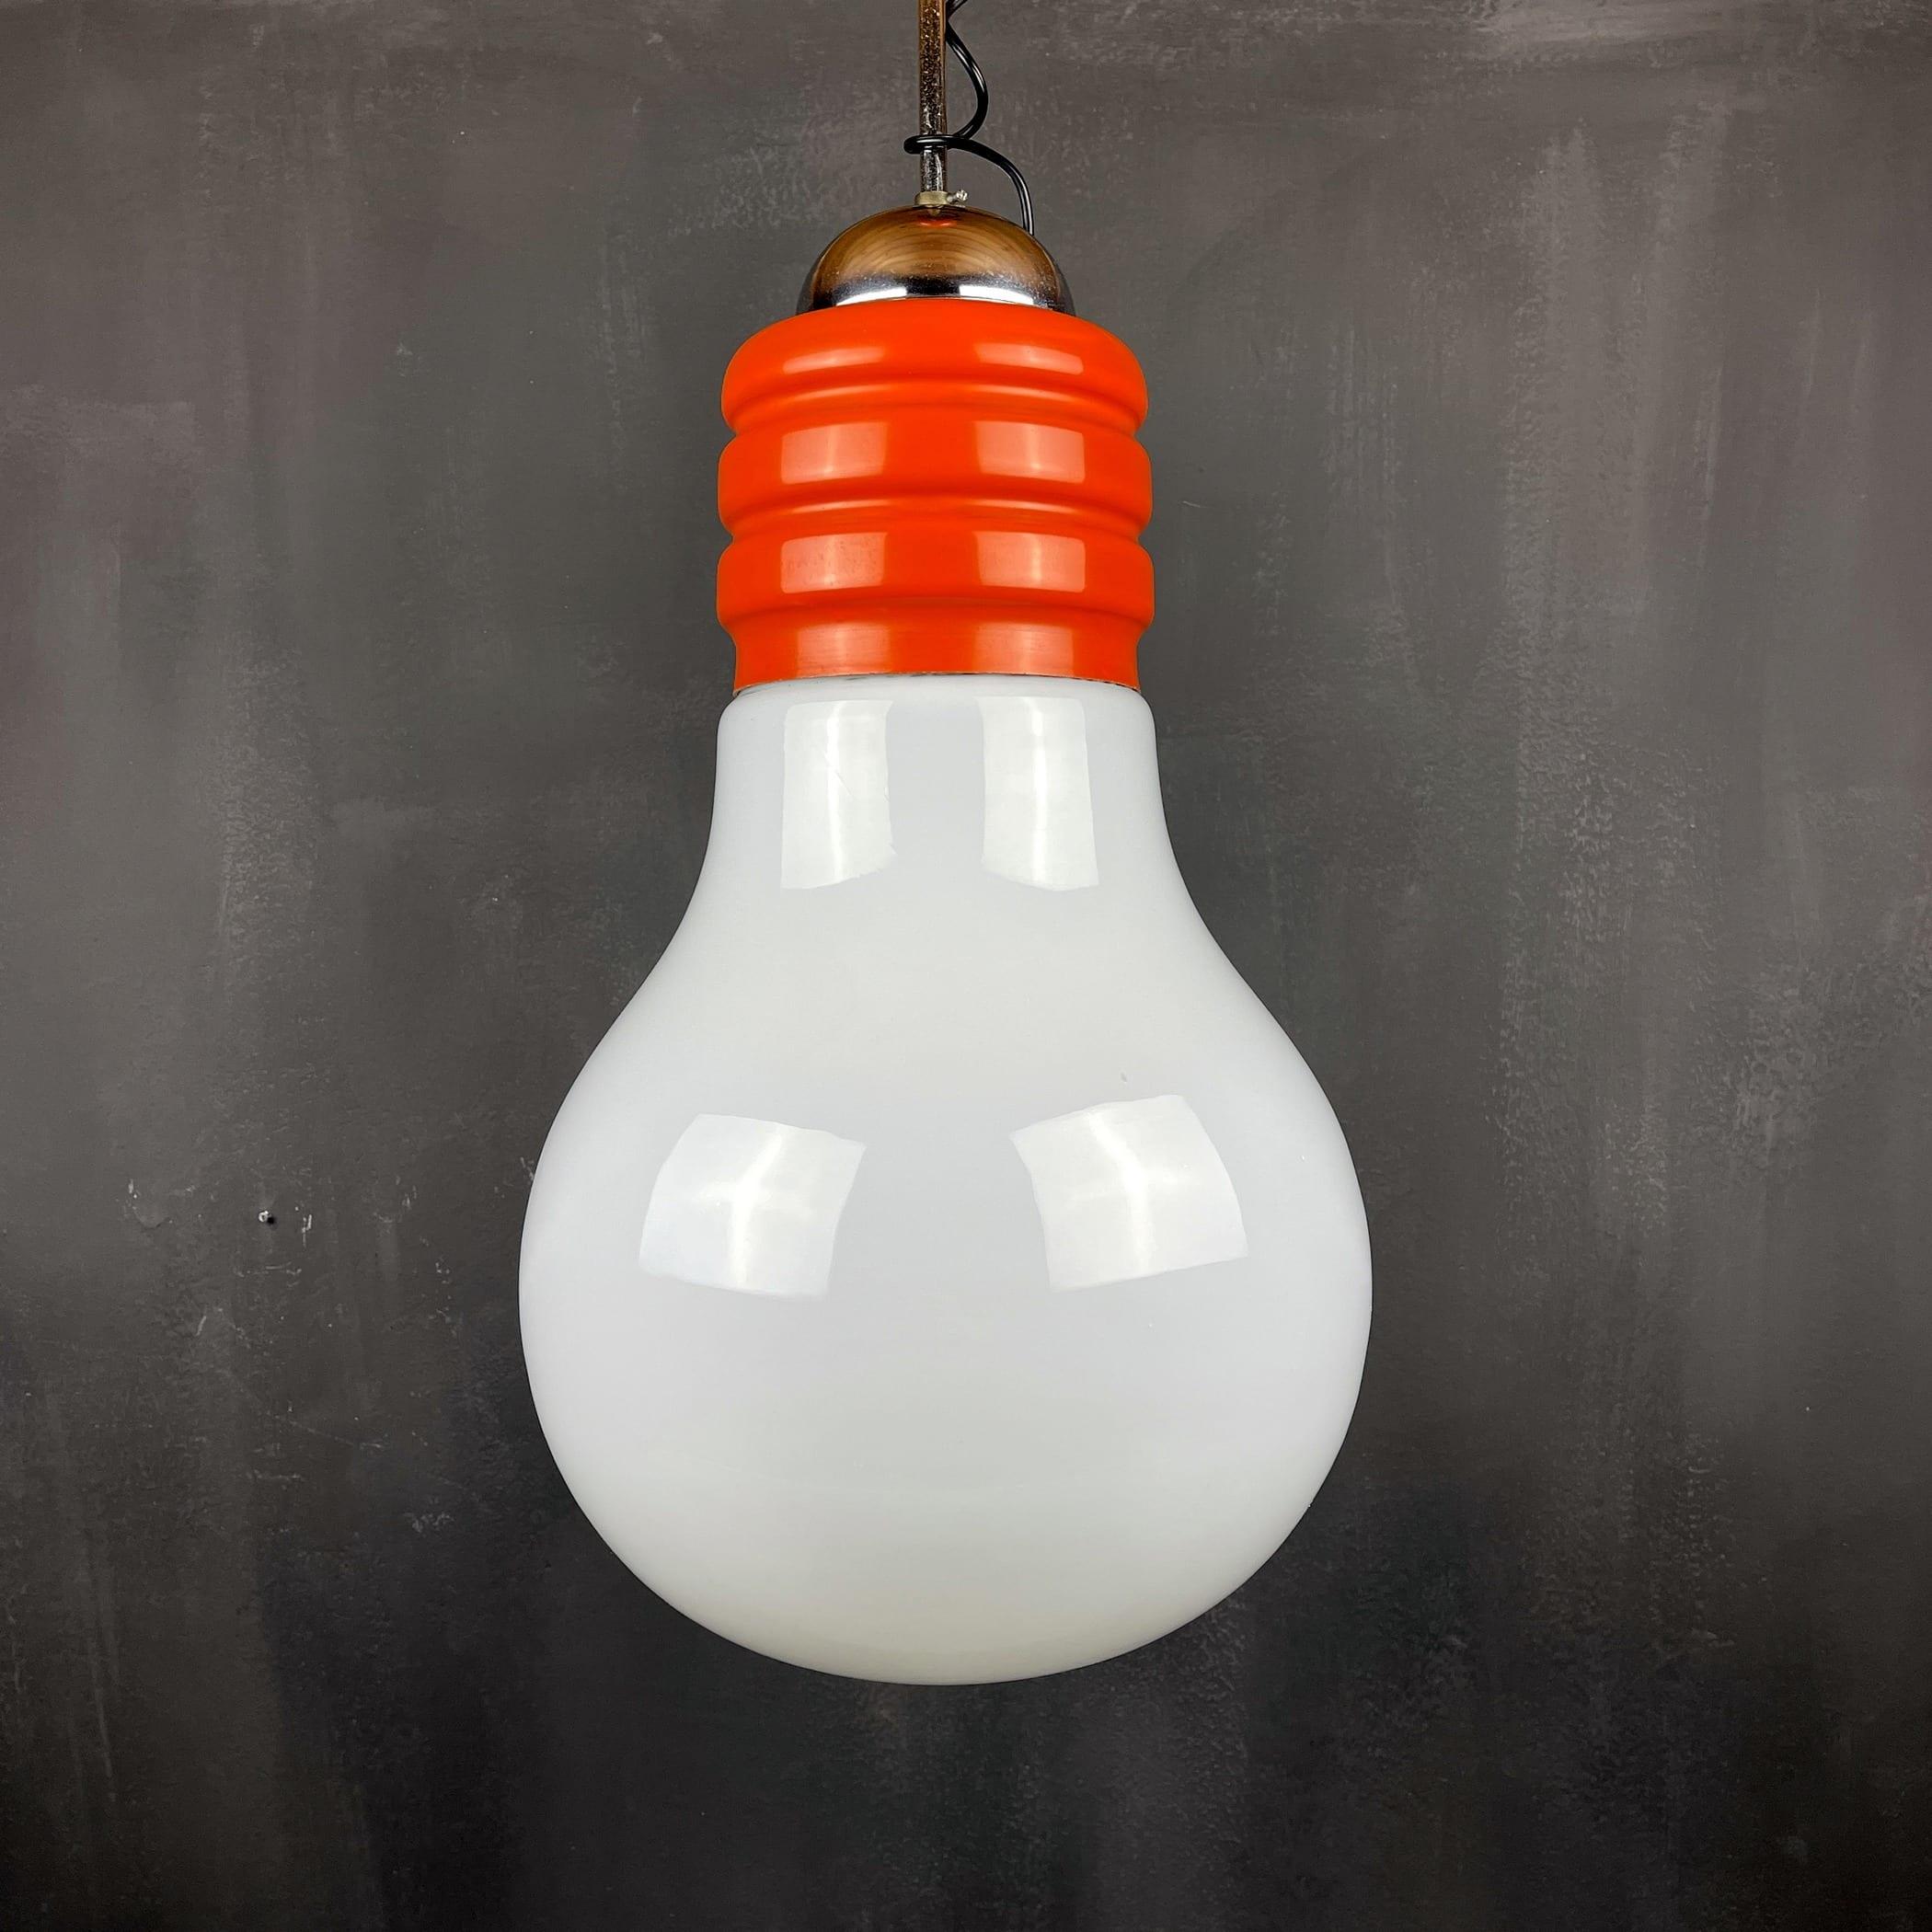 Vintage opaline glass Bulb pendant lamp Italy 1970s space age italian modern mid-century light